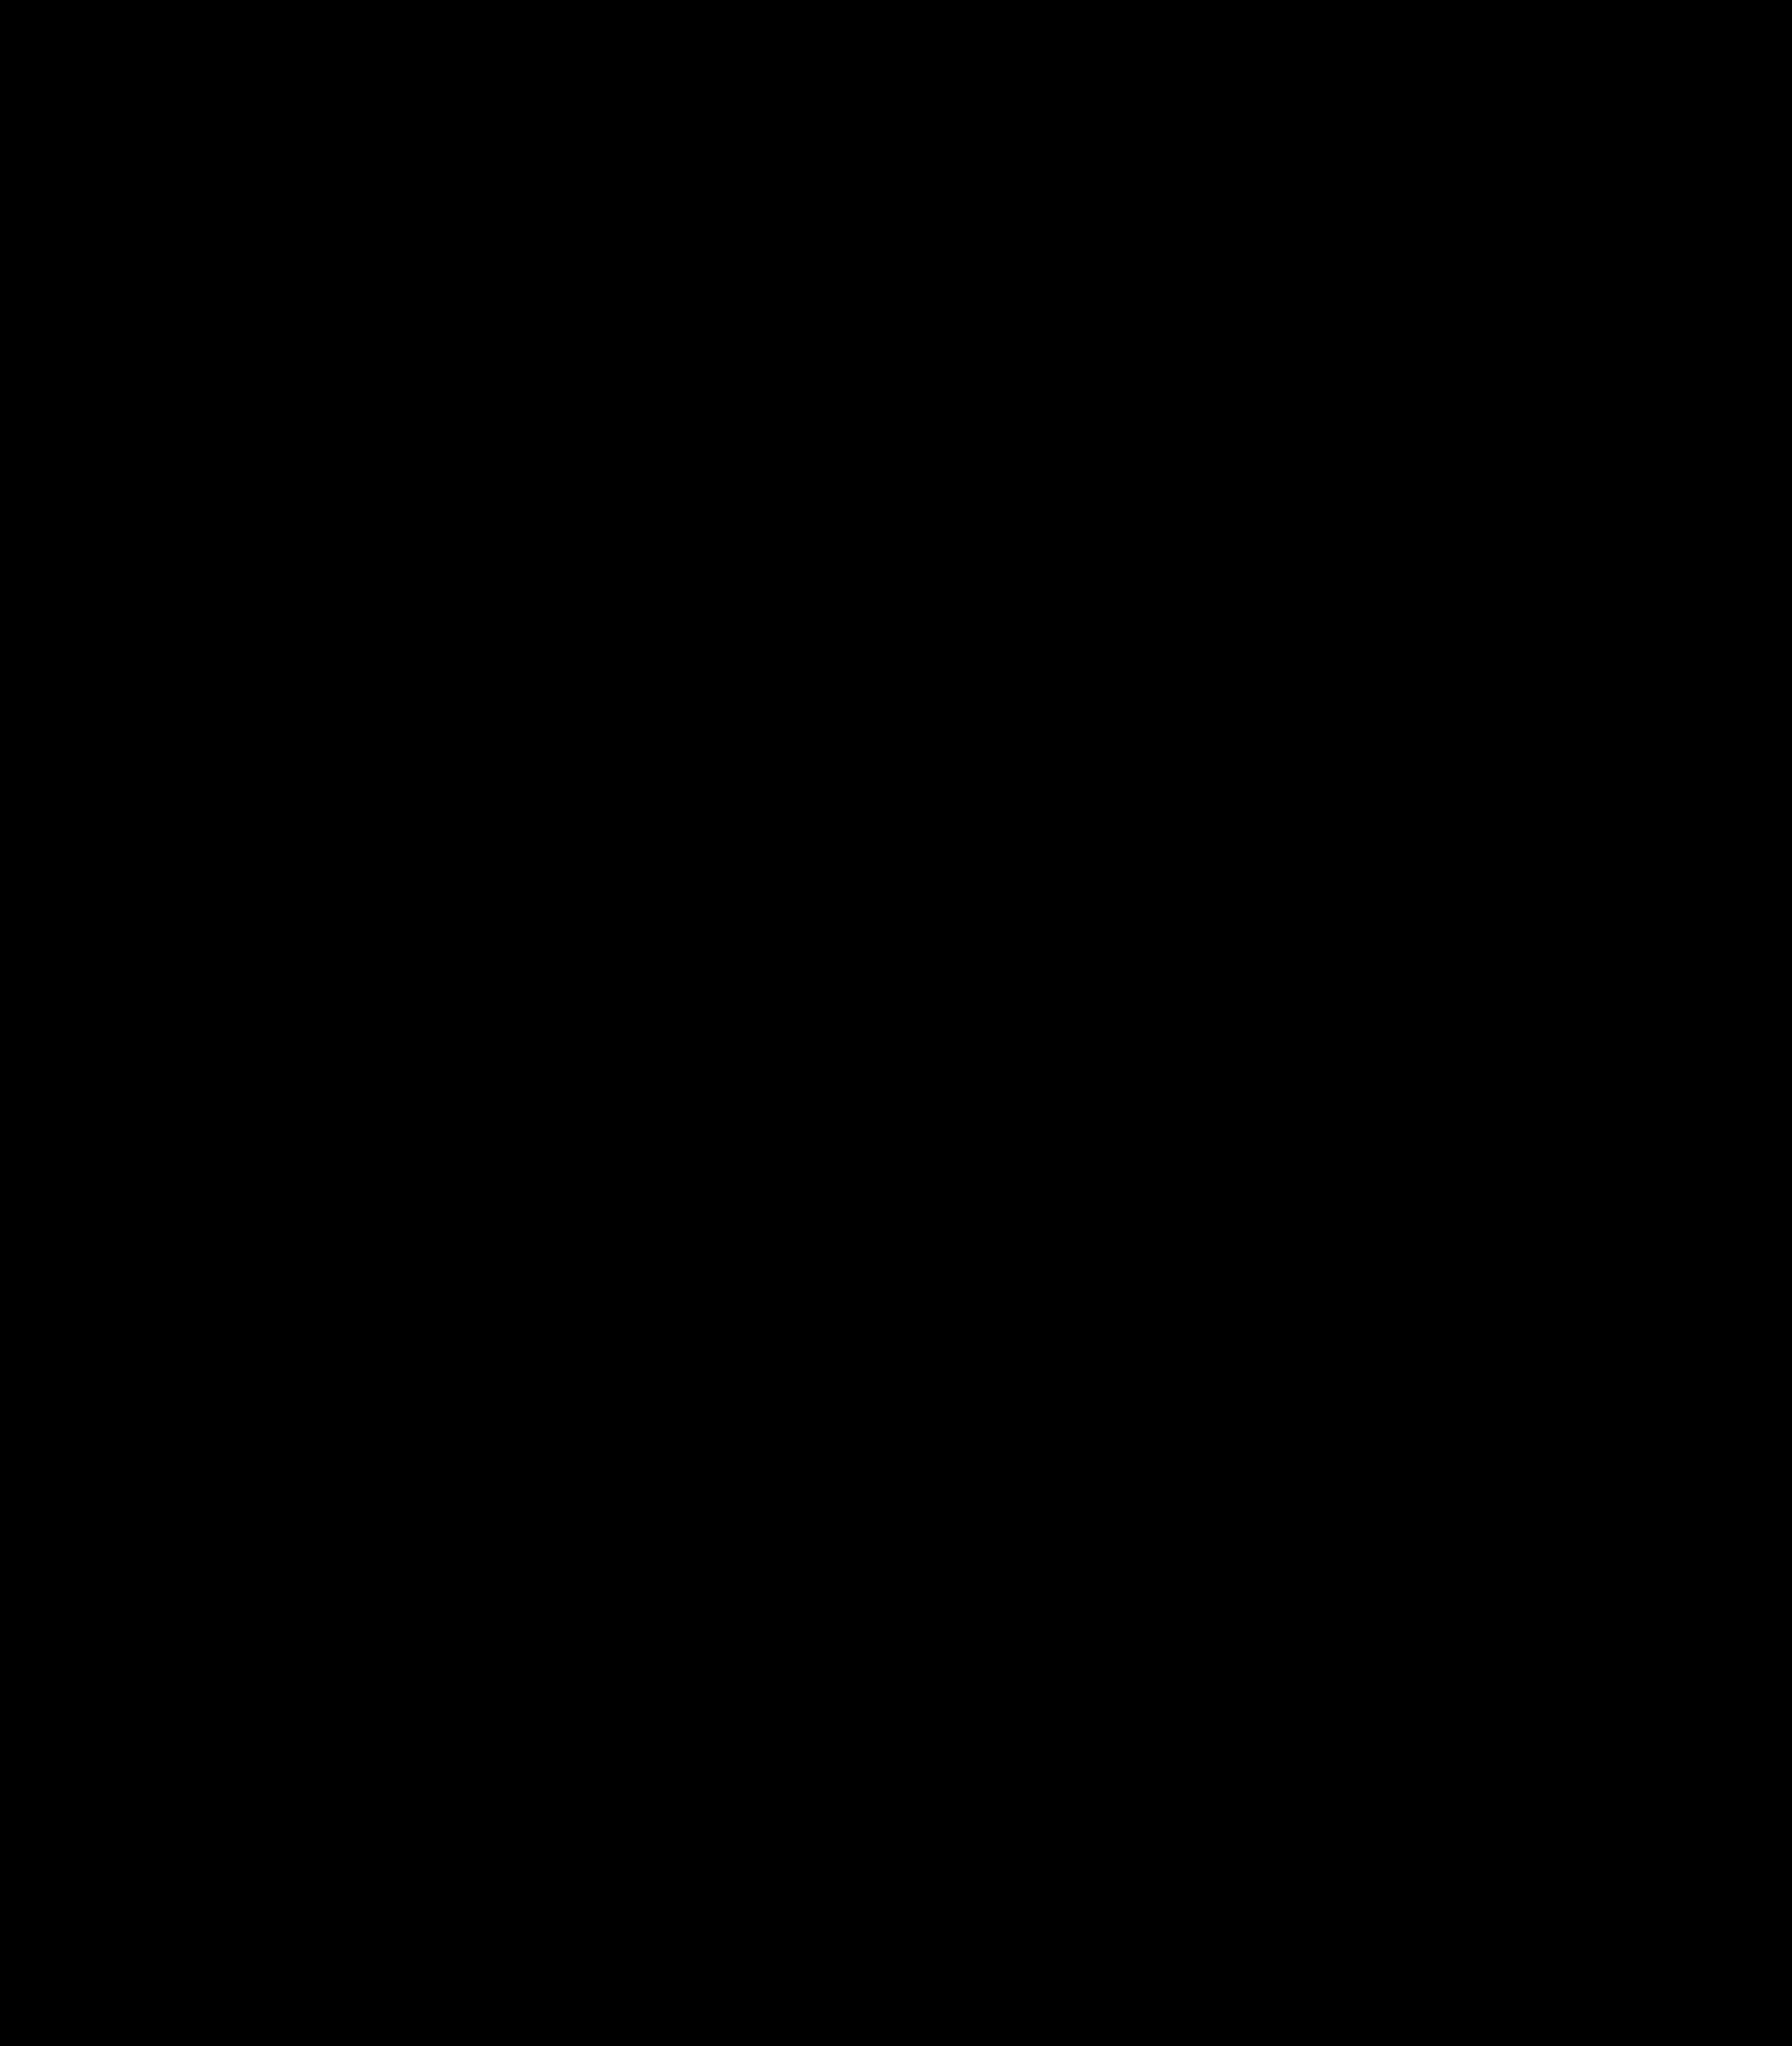 blocknotbar